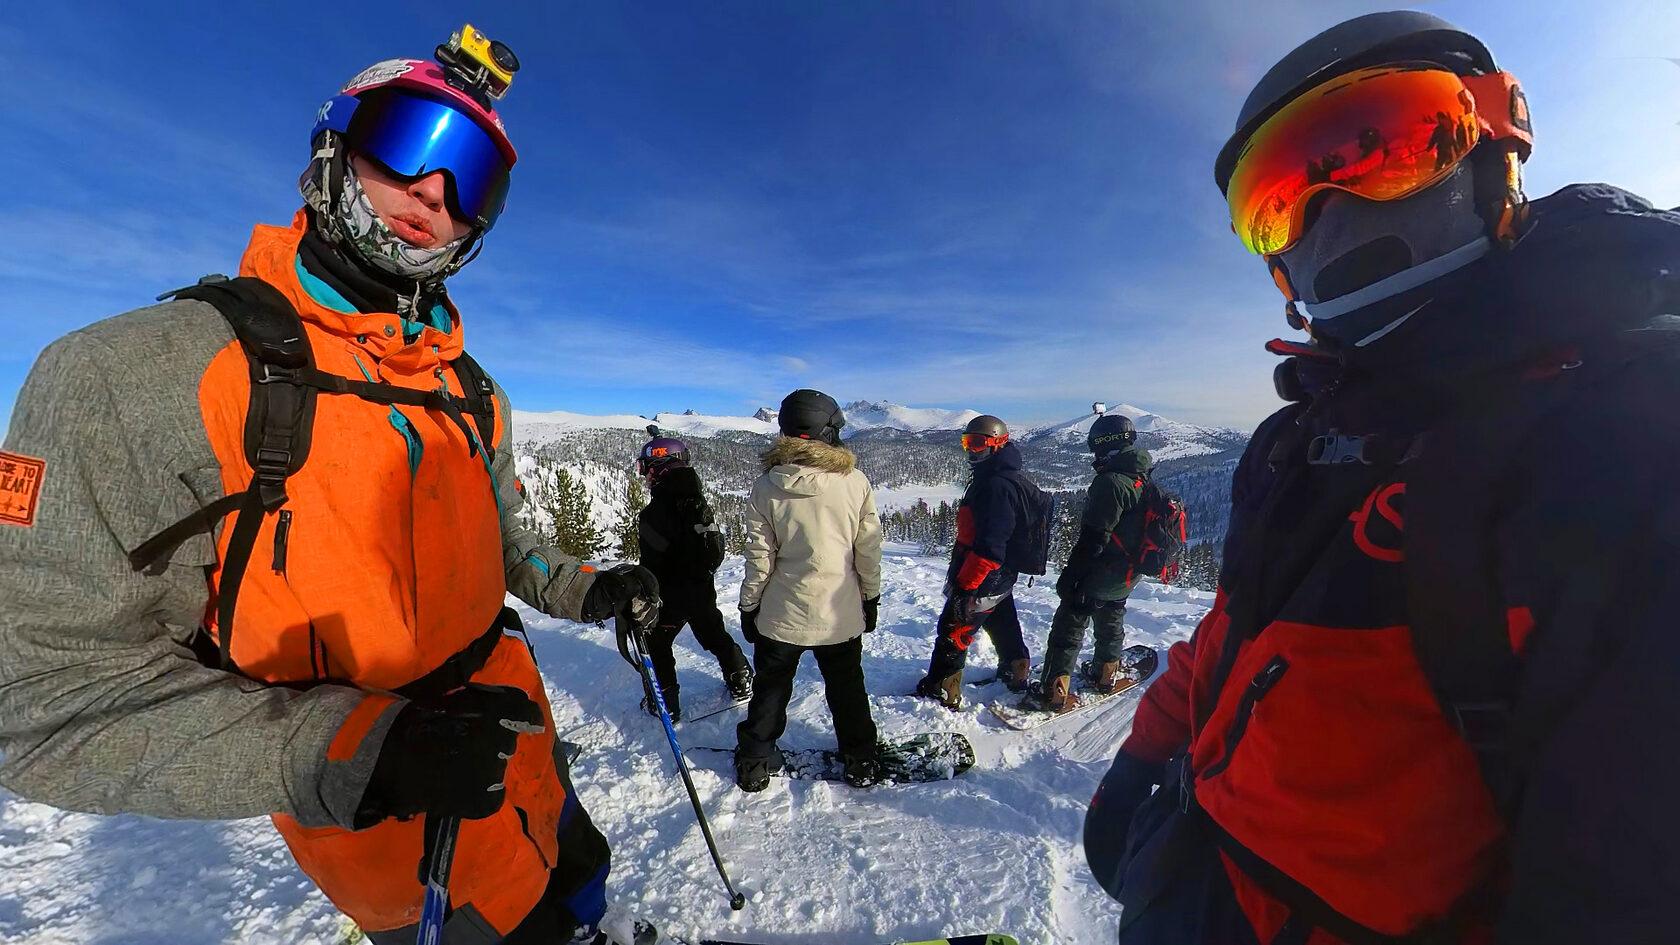 тур на горнолыжный курорт Шерегеш из Москвы